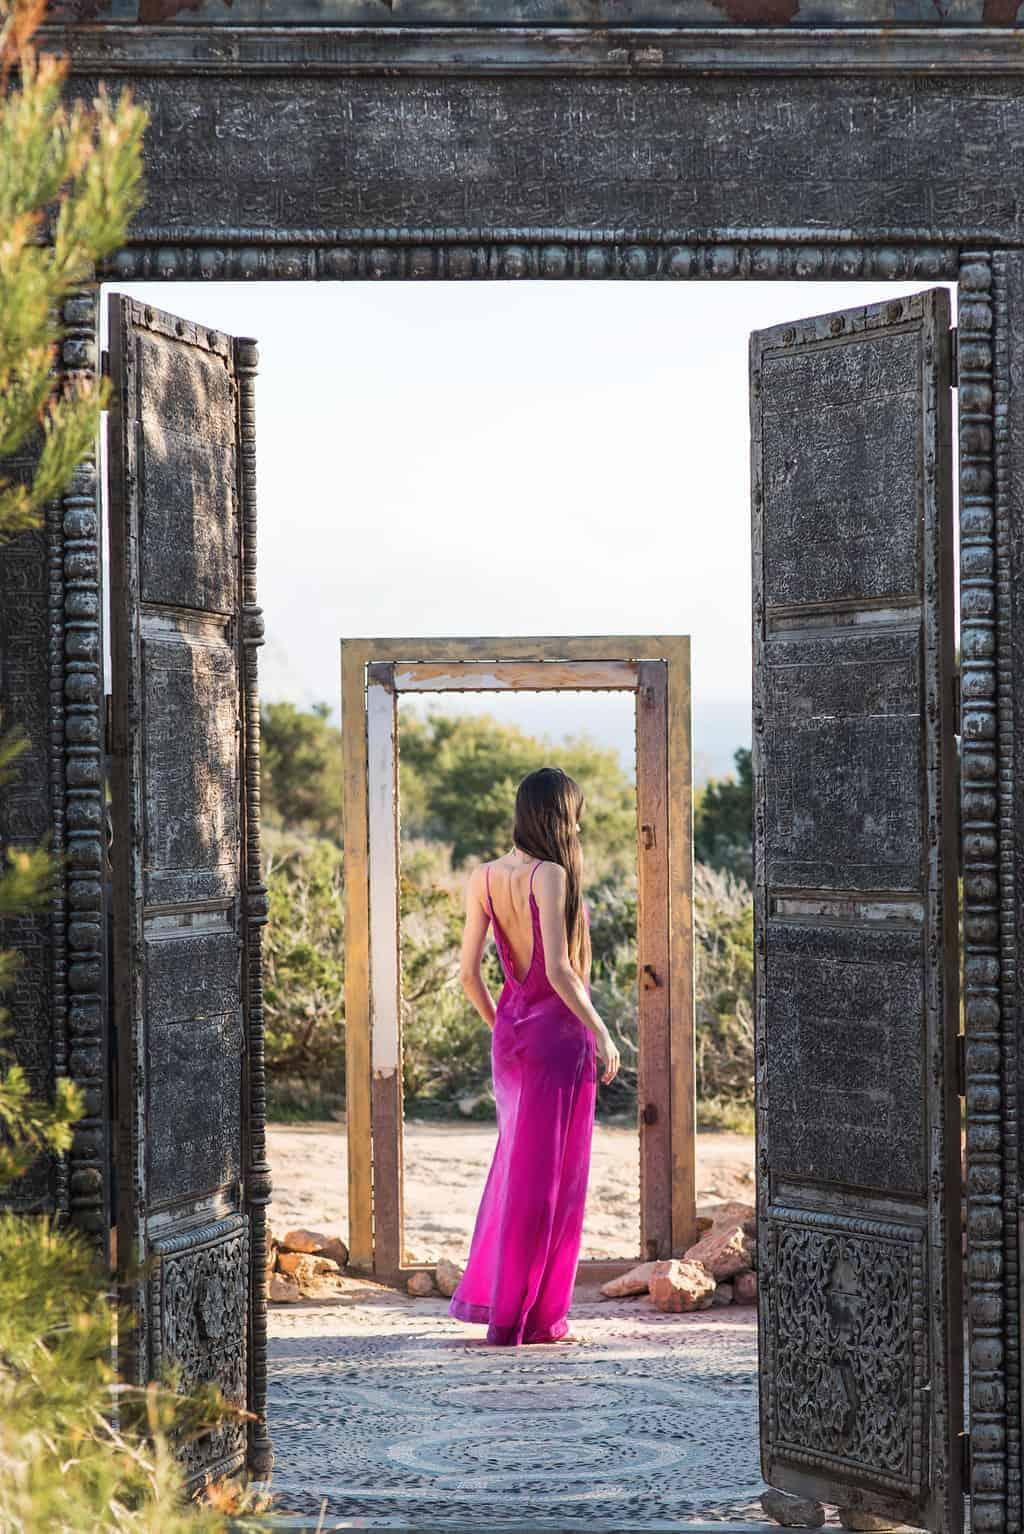 Ibiza beach style girl in a pink dress